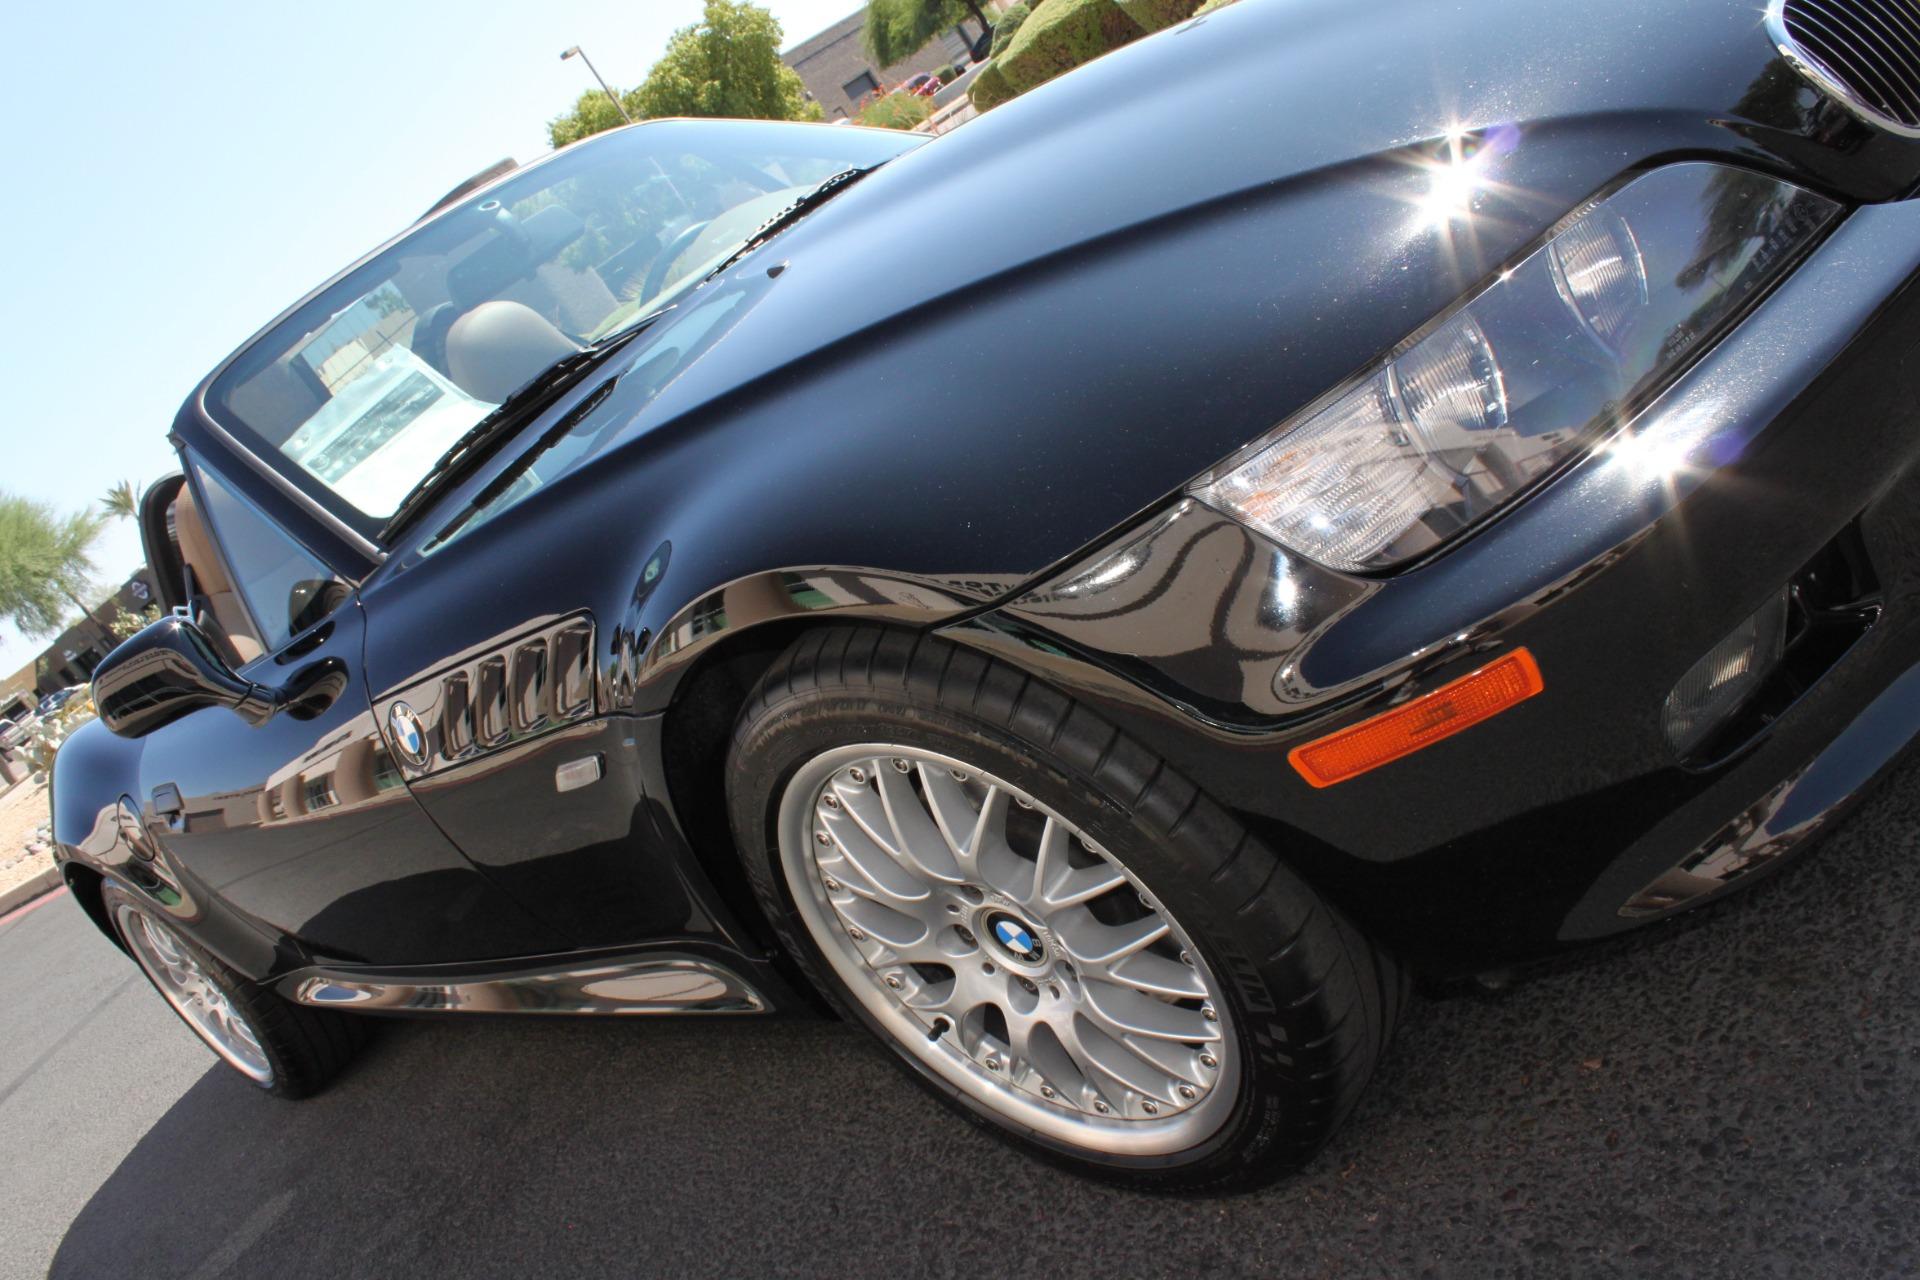 Used-2001-BMW-Z3-Roadster-30i-Chevrolet